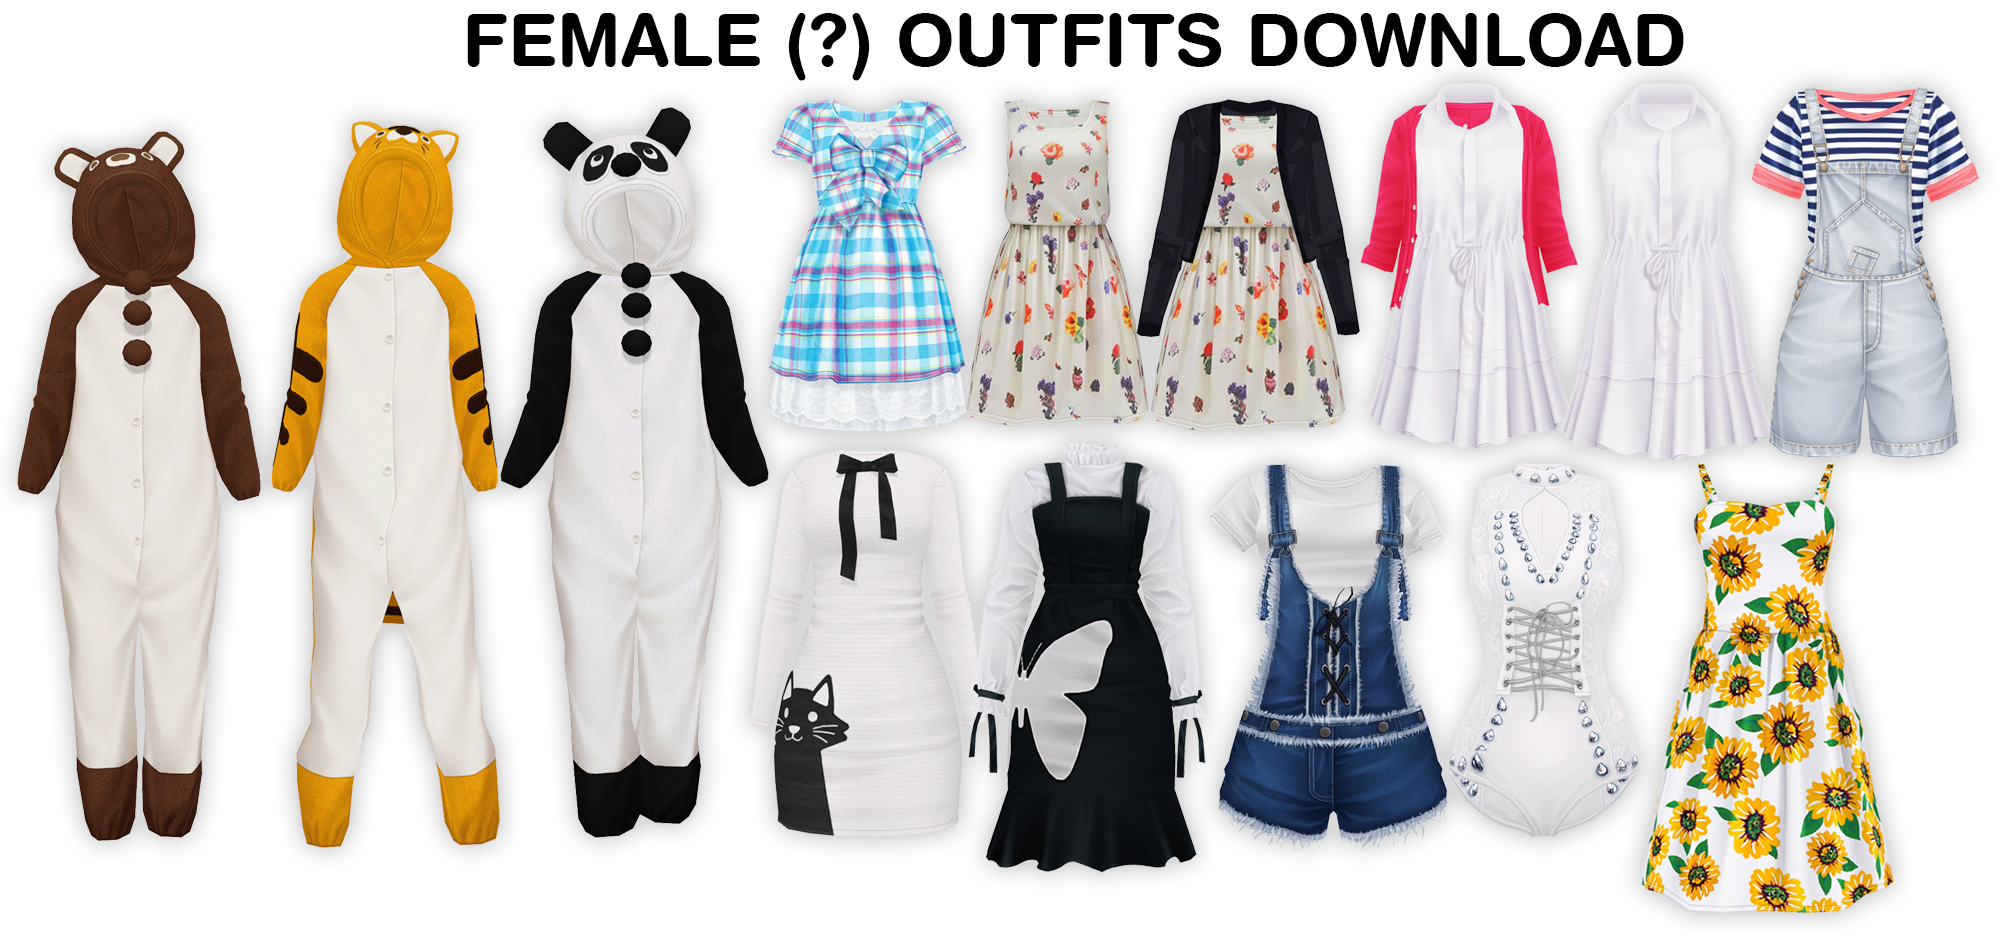 Mmd Clothes Favourites By XxMinishaxX On DeviantArt